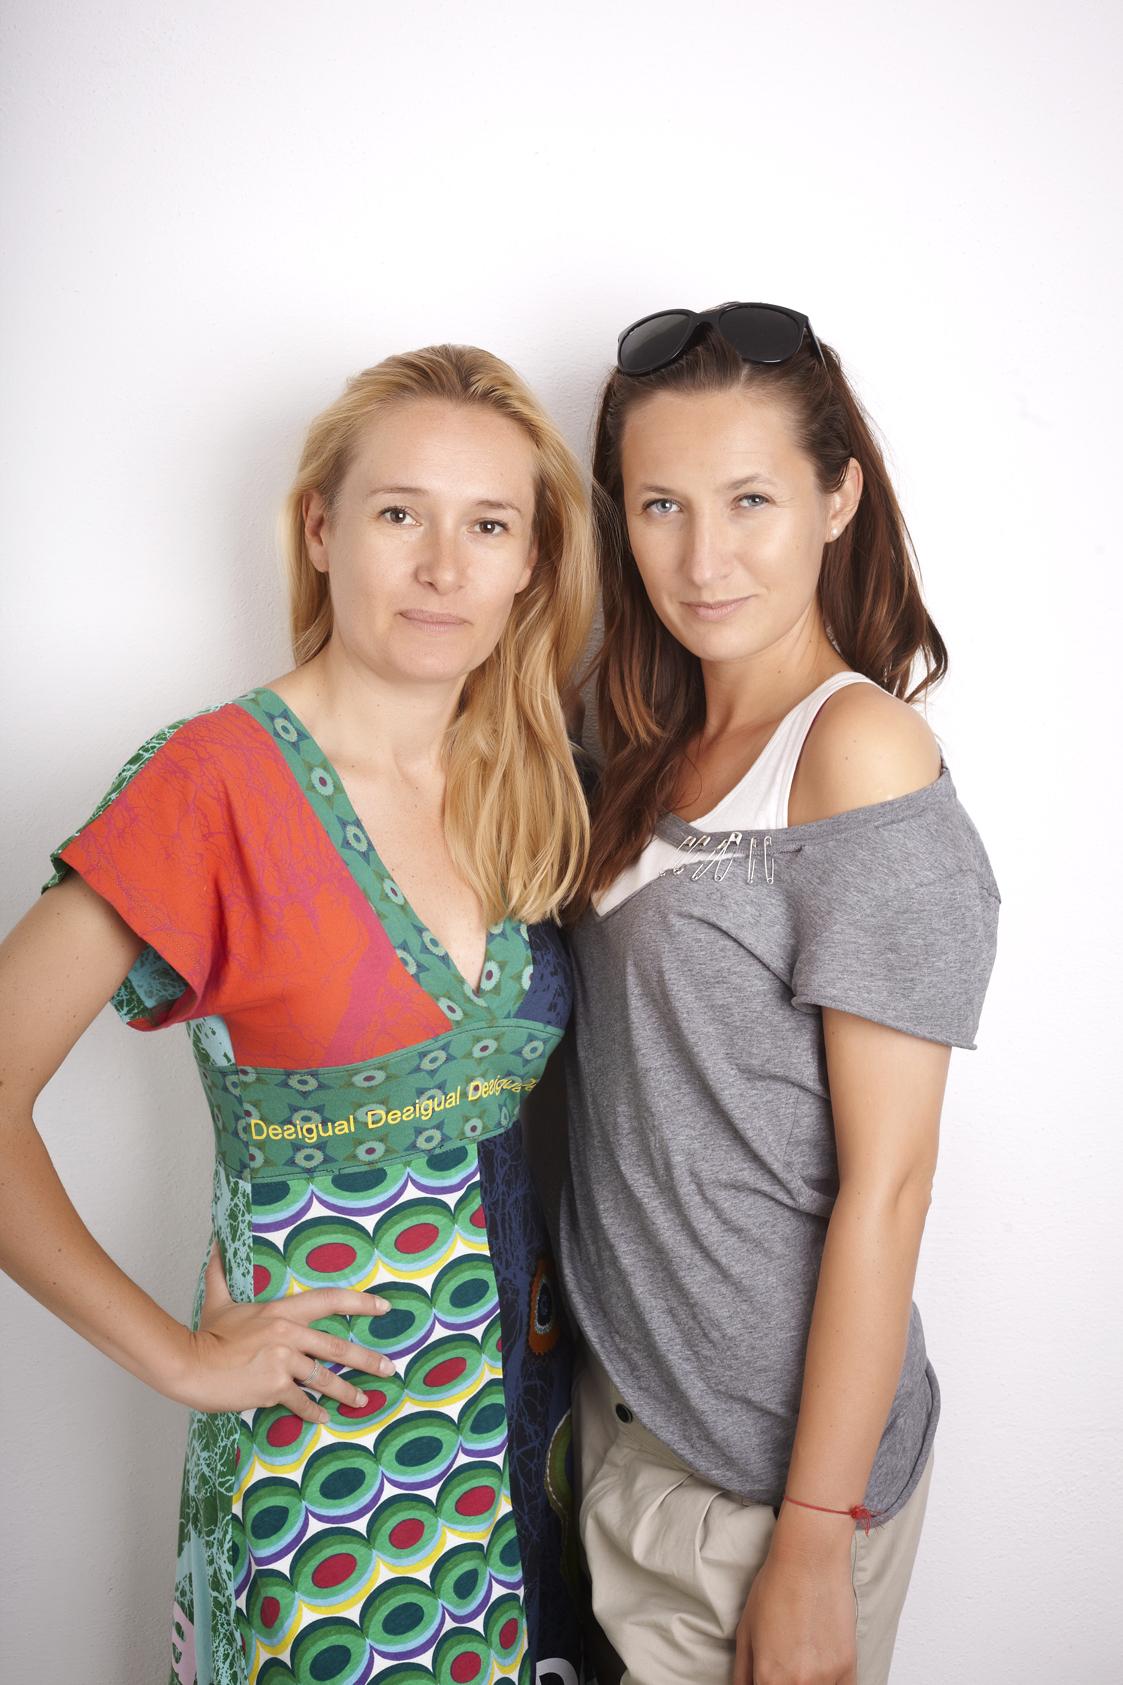 Autorki projektu Loft37.pl - Paulina i Joanna